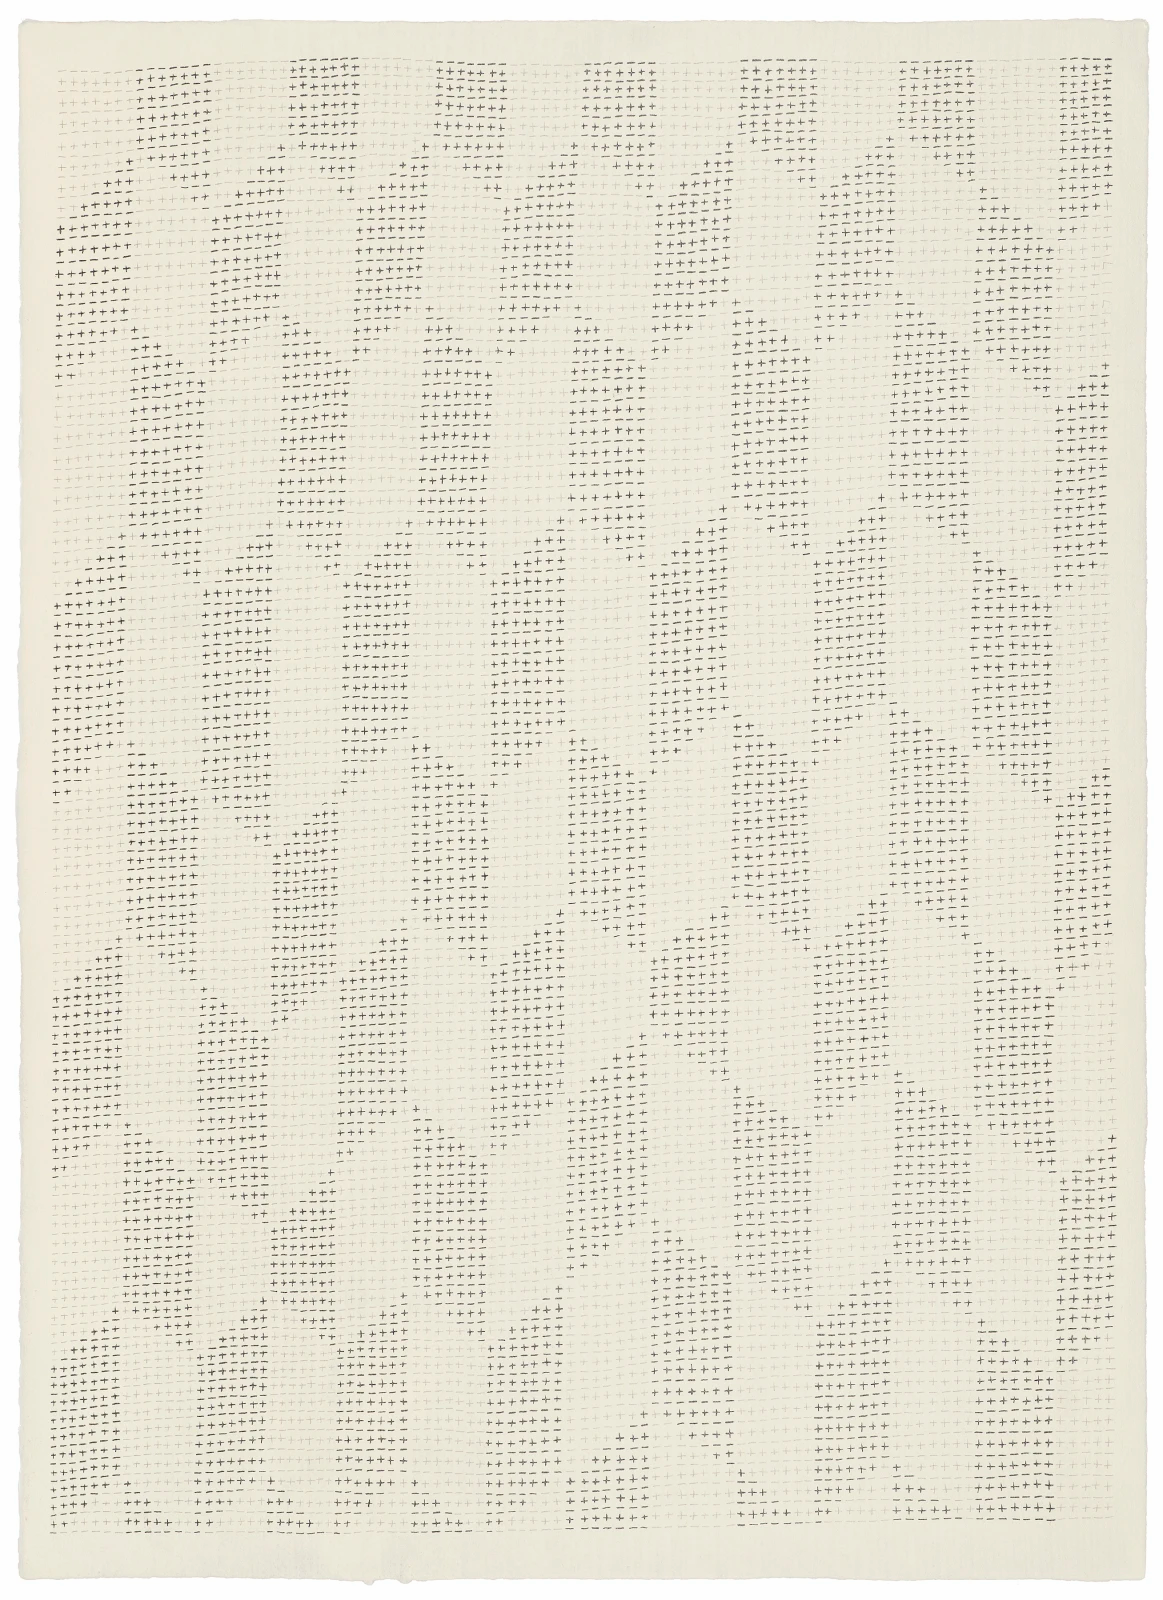 201117, 2017 Pencil on handmade cotton paper (Fabriano Roma) 66 x 48 cm | 26 x 18 7/8 in